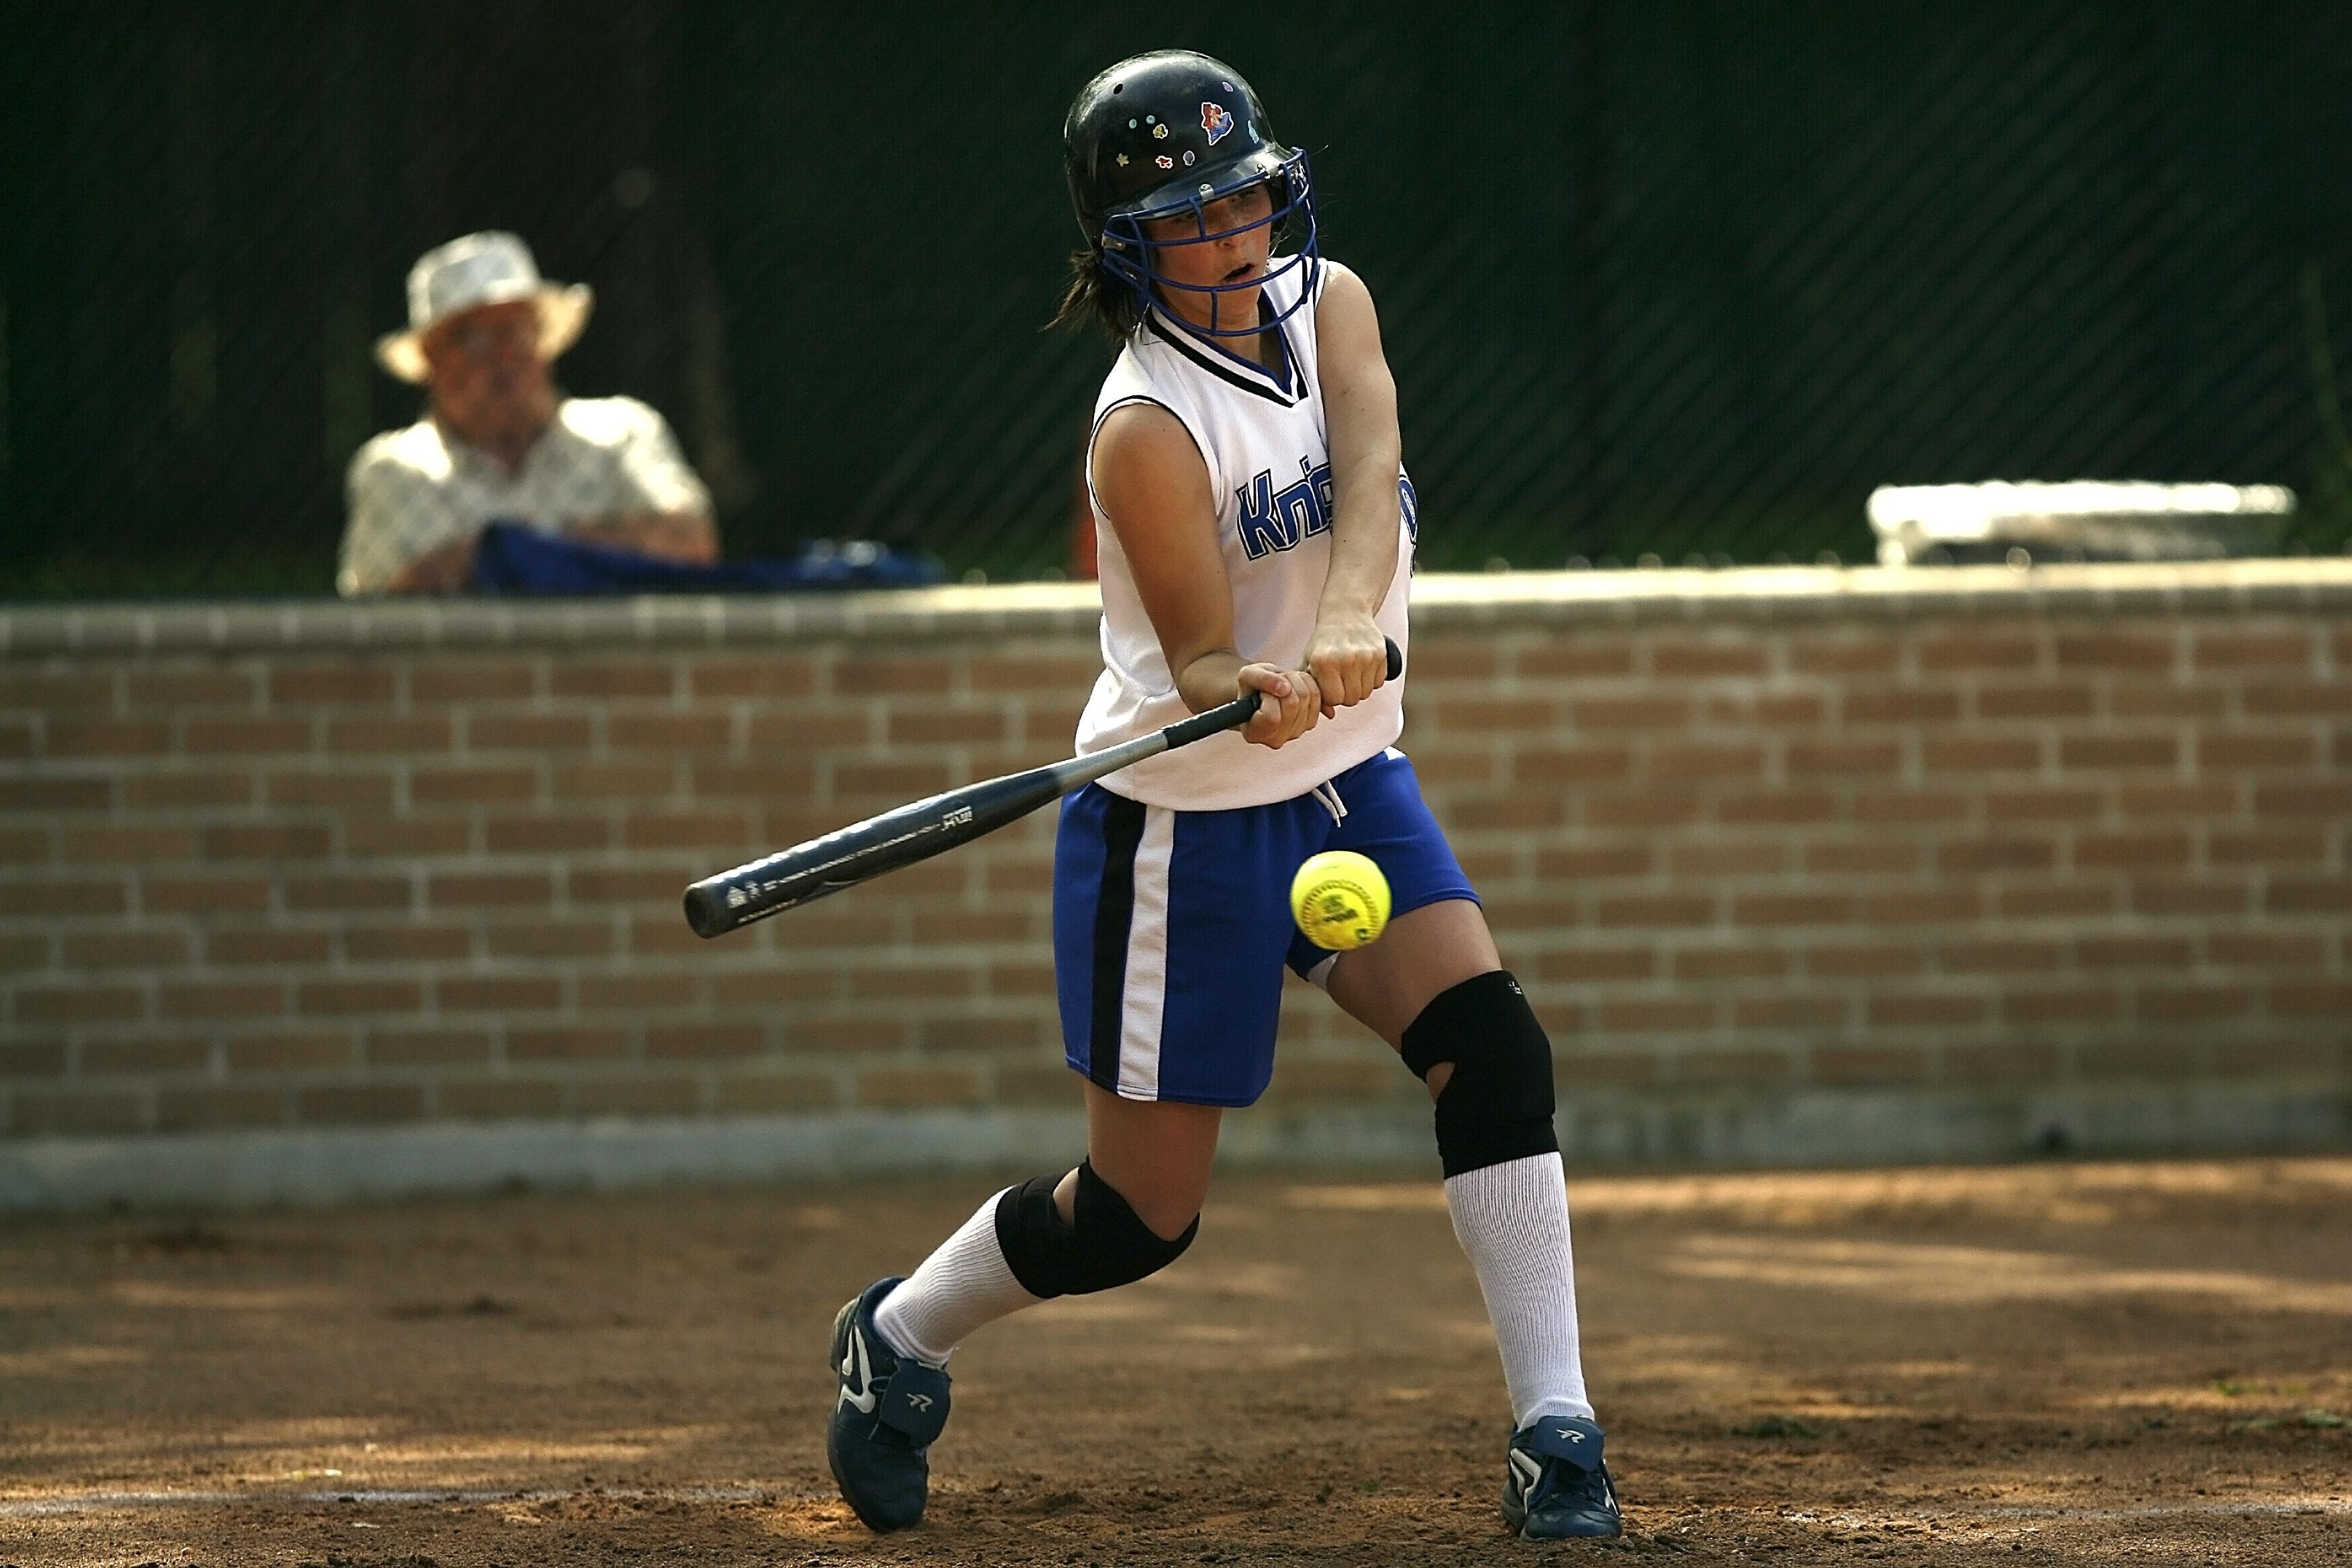 Girl Swinging Fastpitch Softball Bat